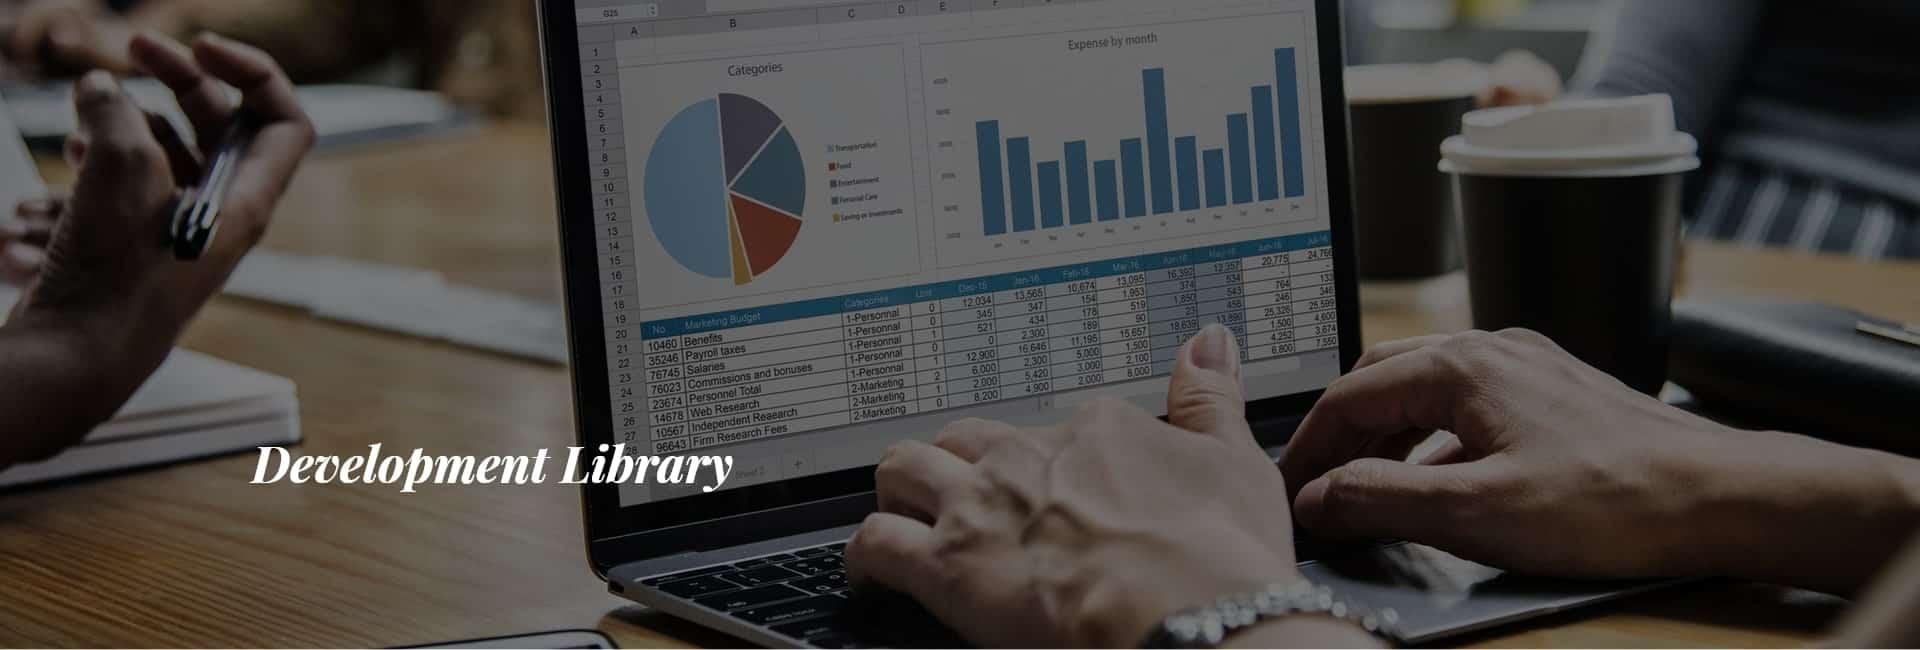 IT Project Management Software